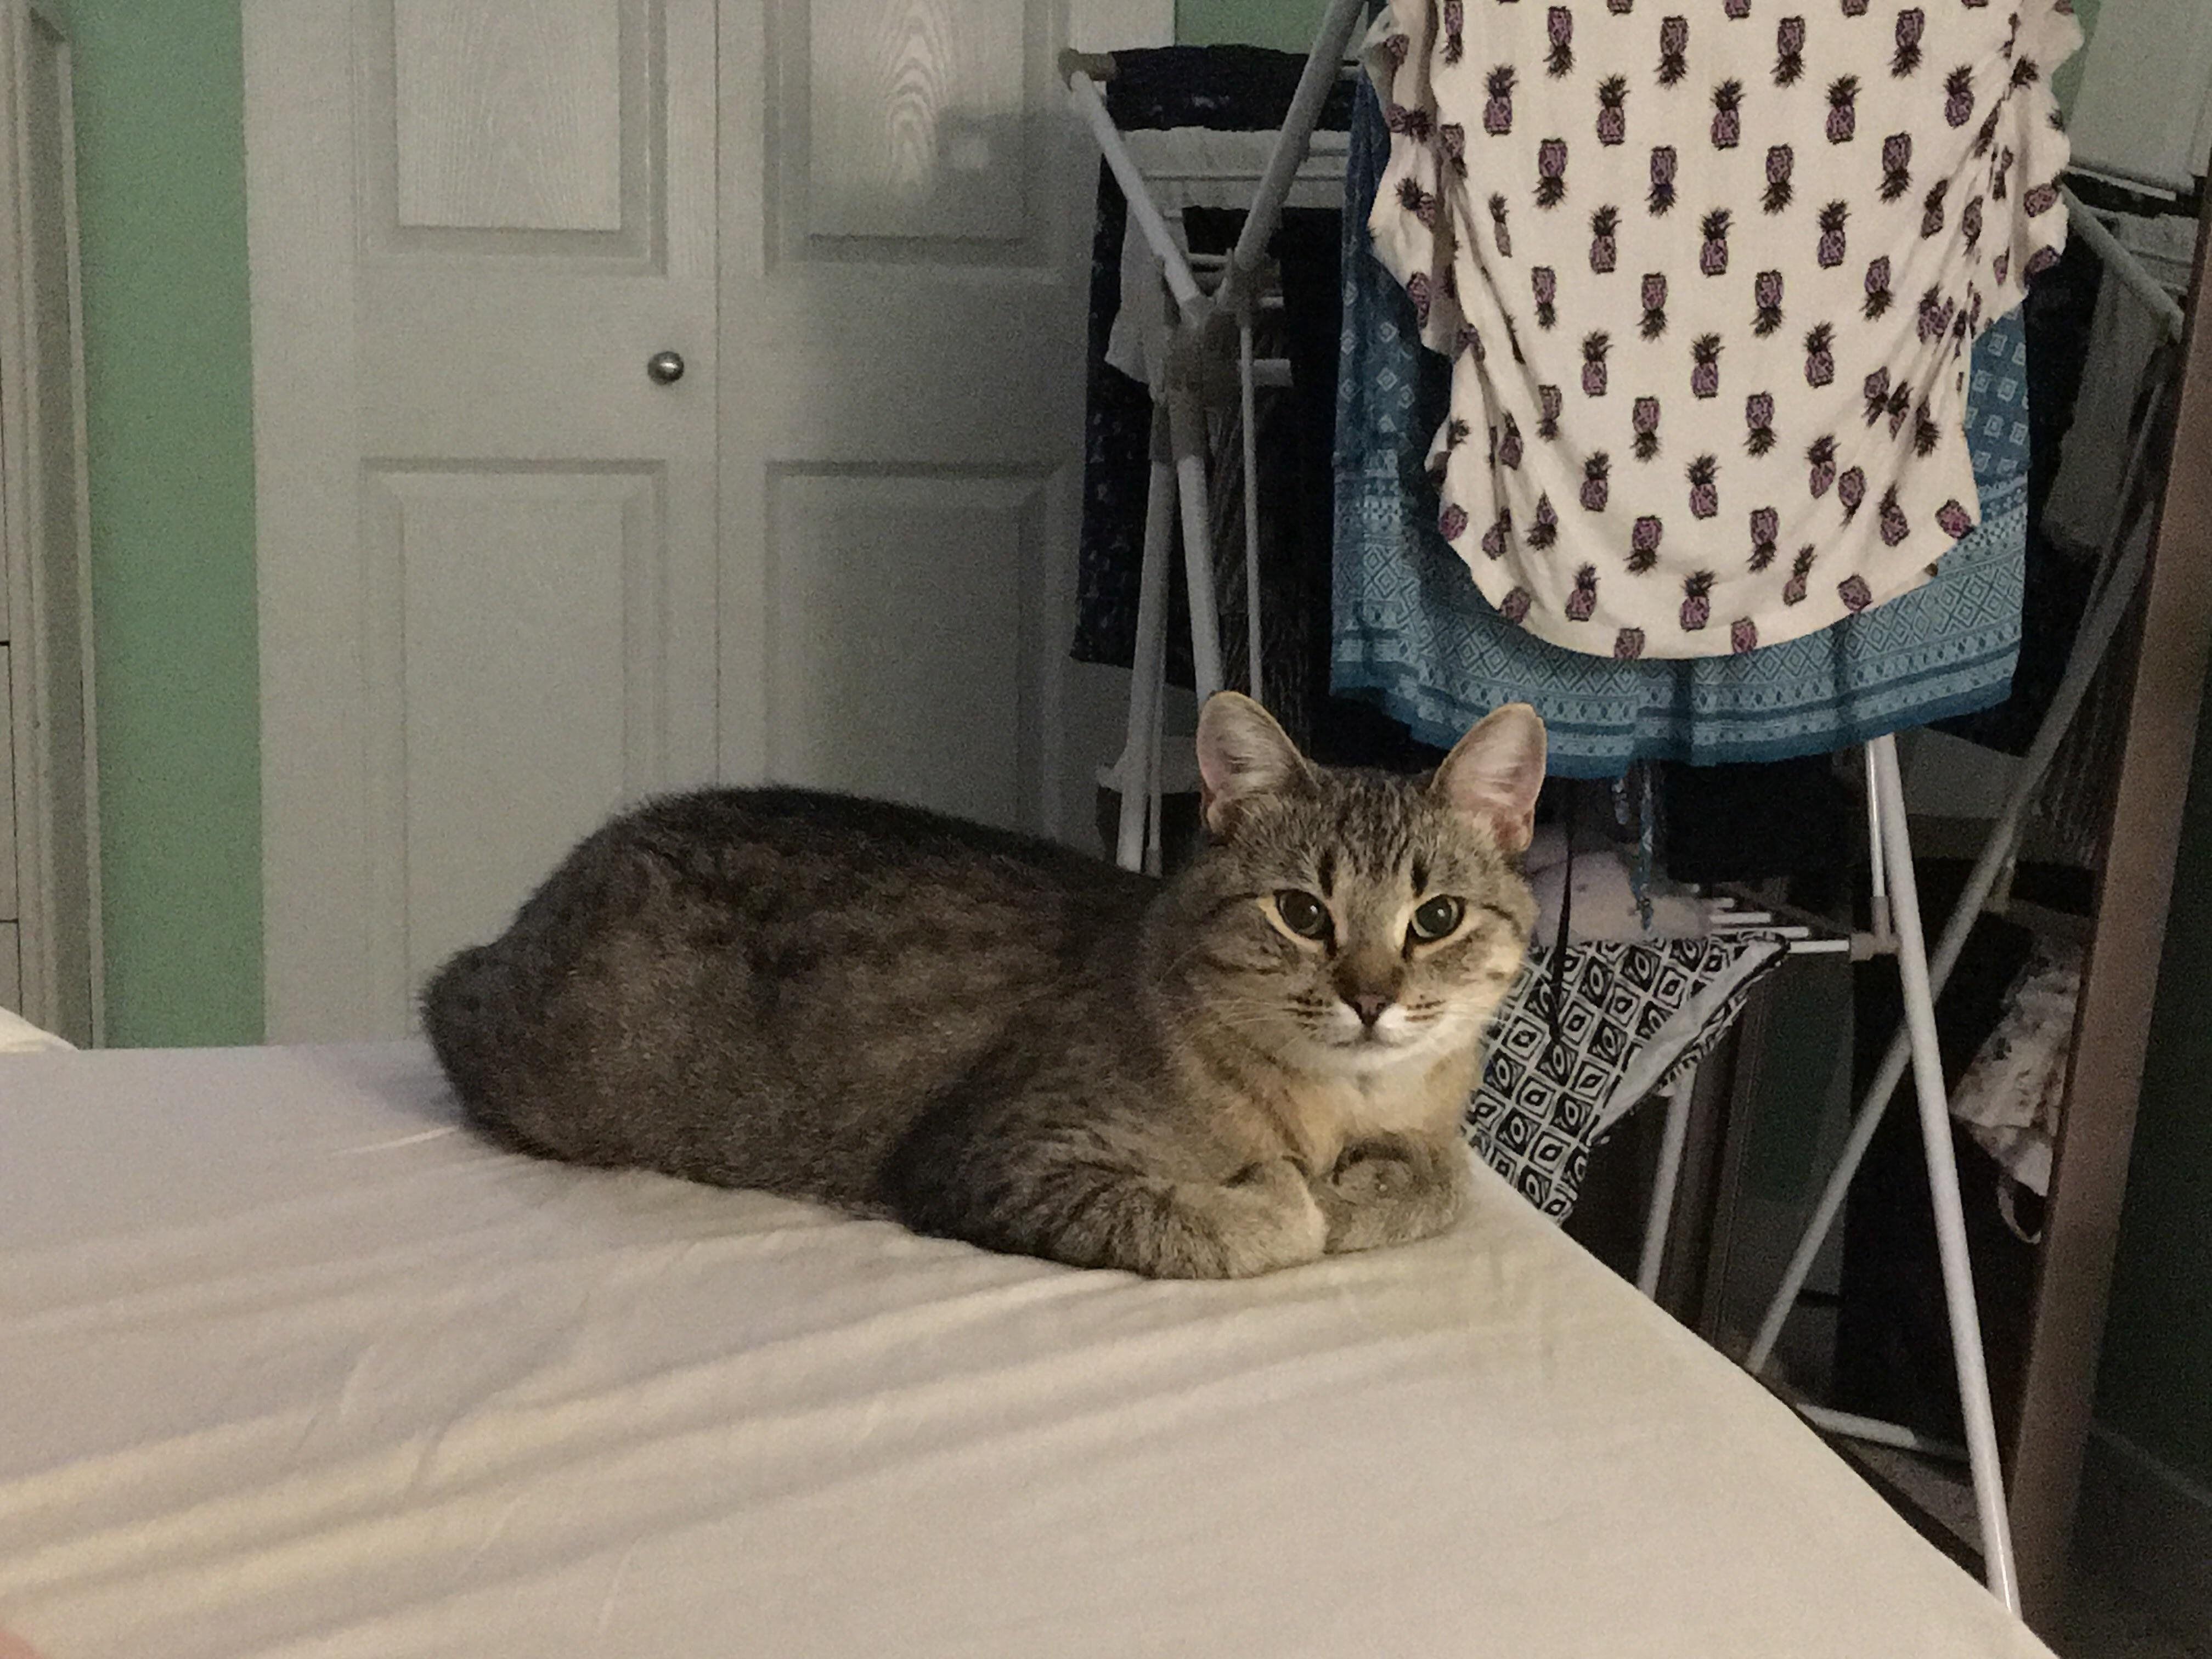 Super shy foster kitty loafing near me! Win! Super cute